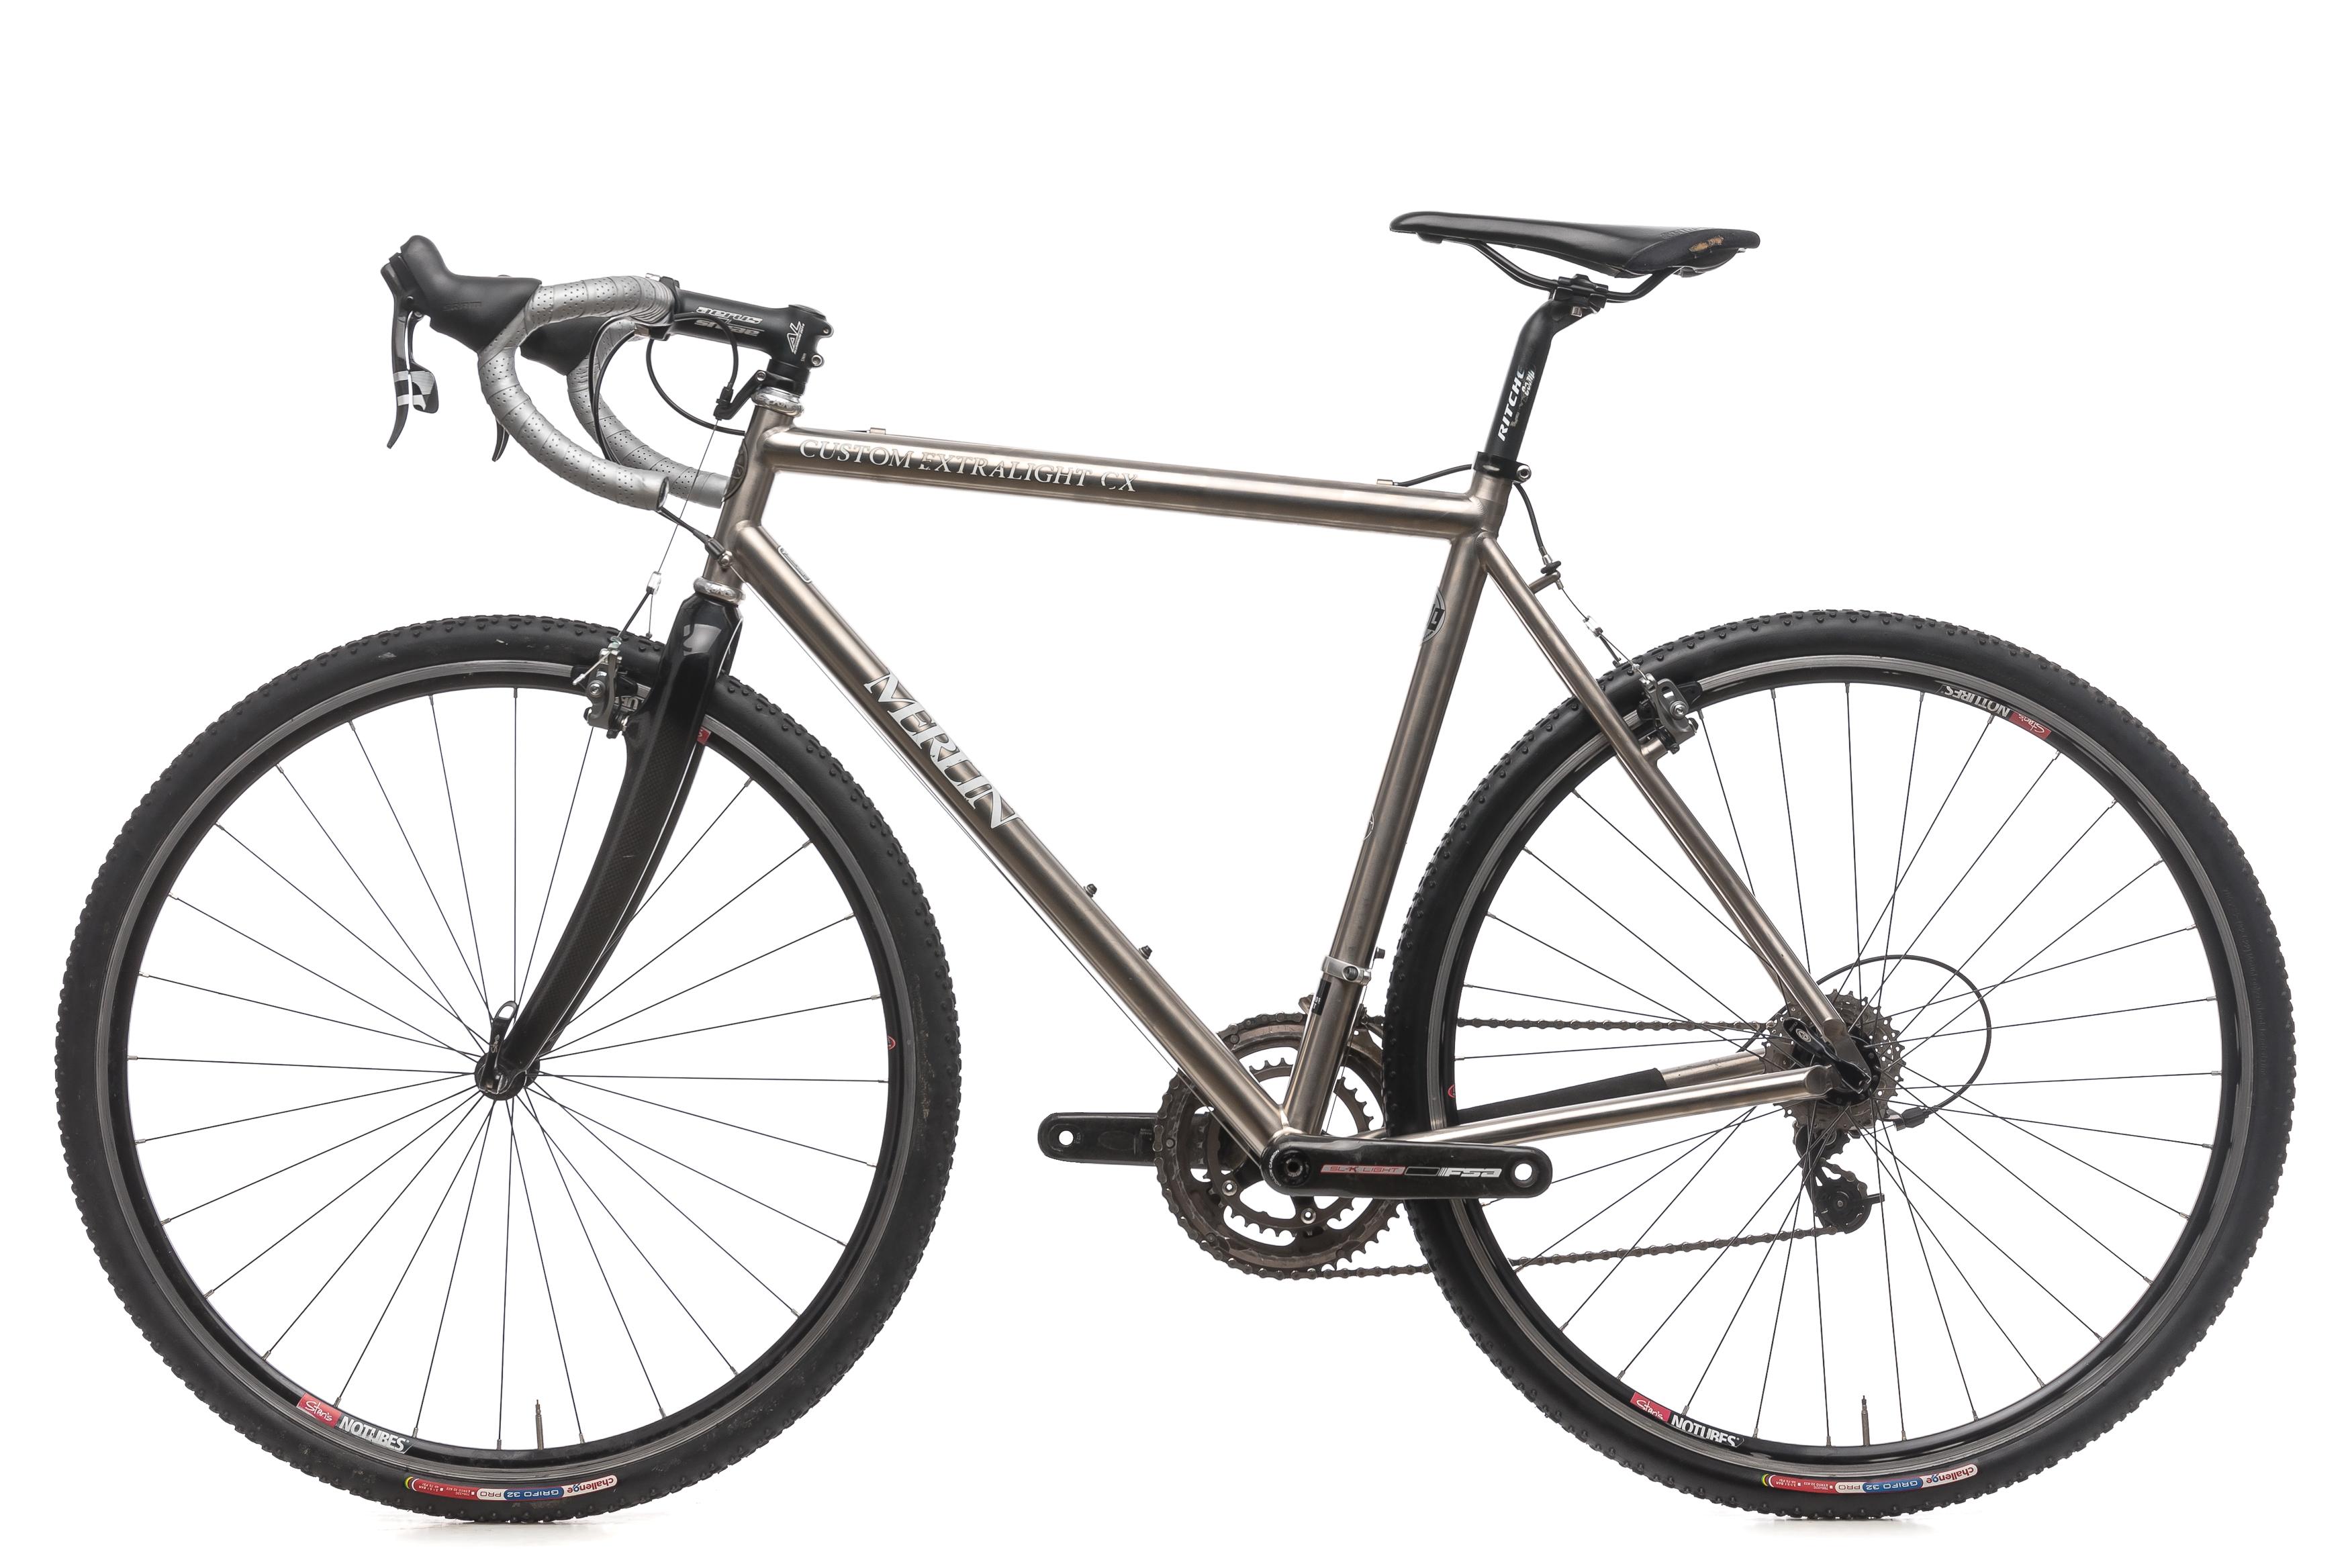 Bicicleta de ciclocross Merlin Personalizado Extralight CX 54cm